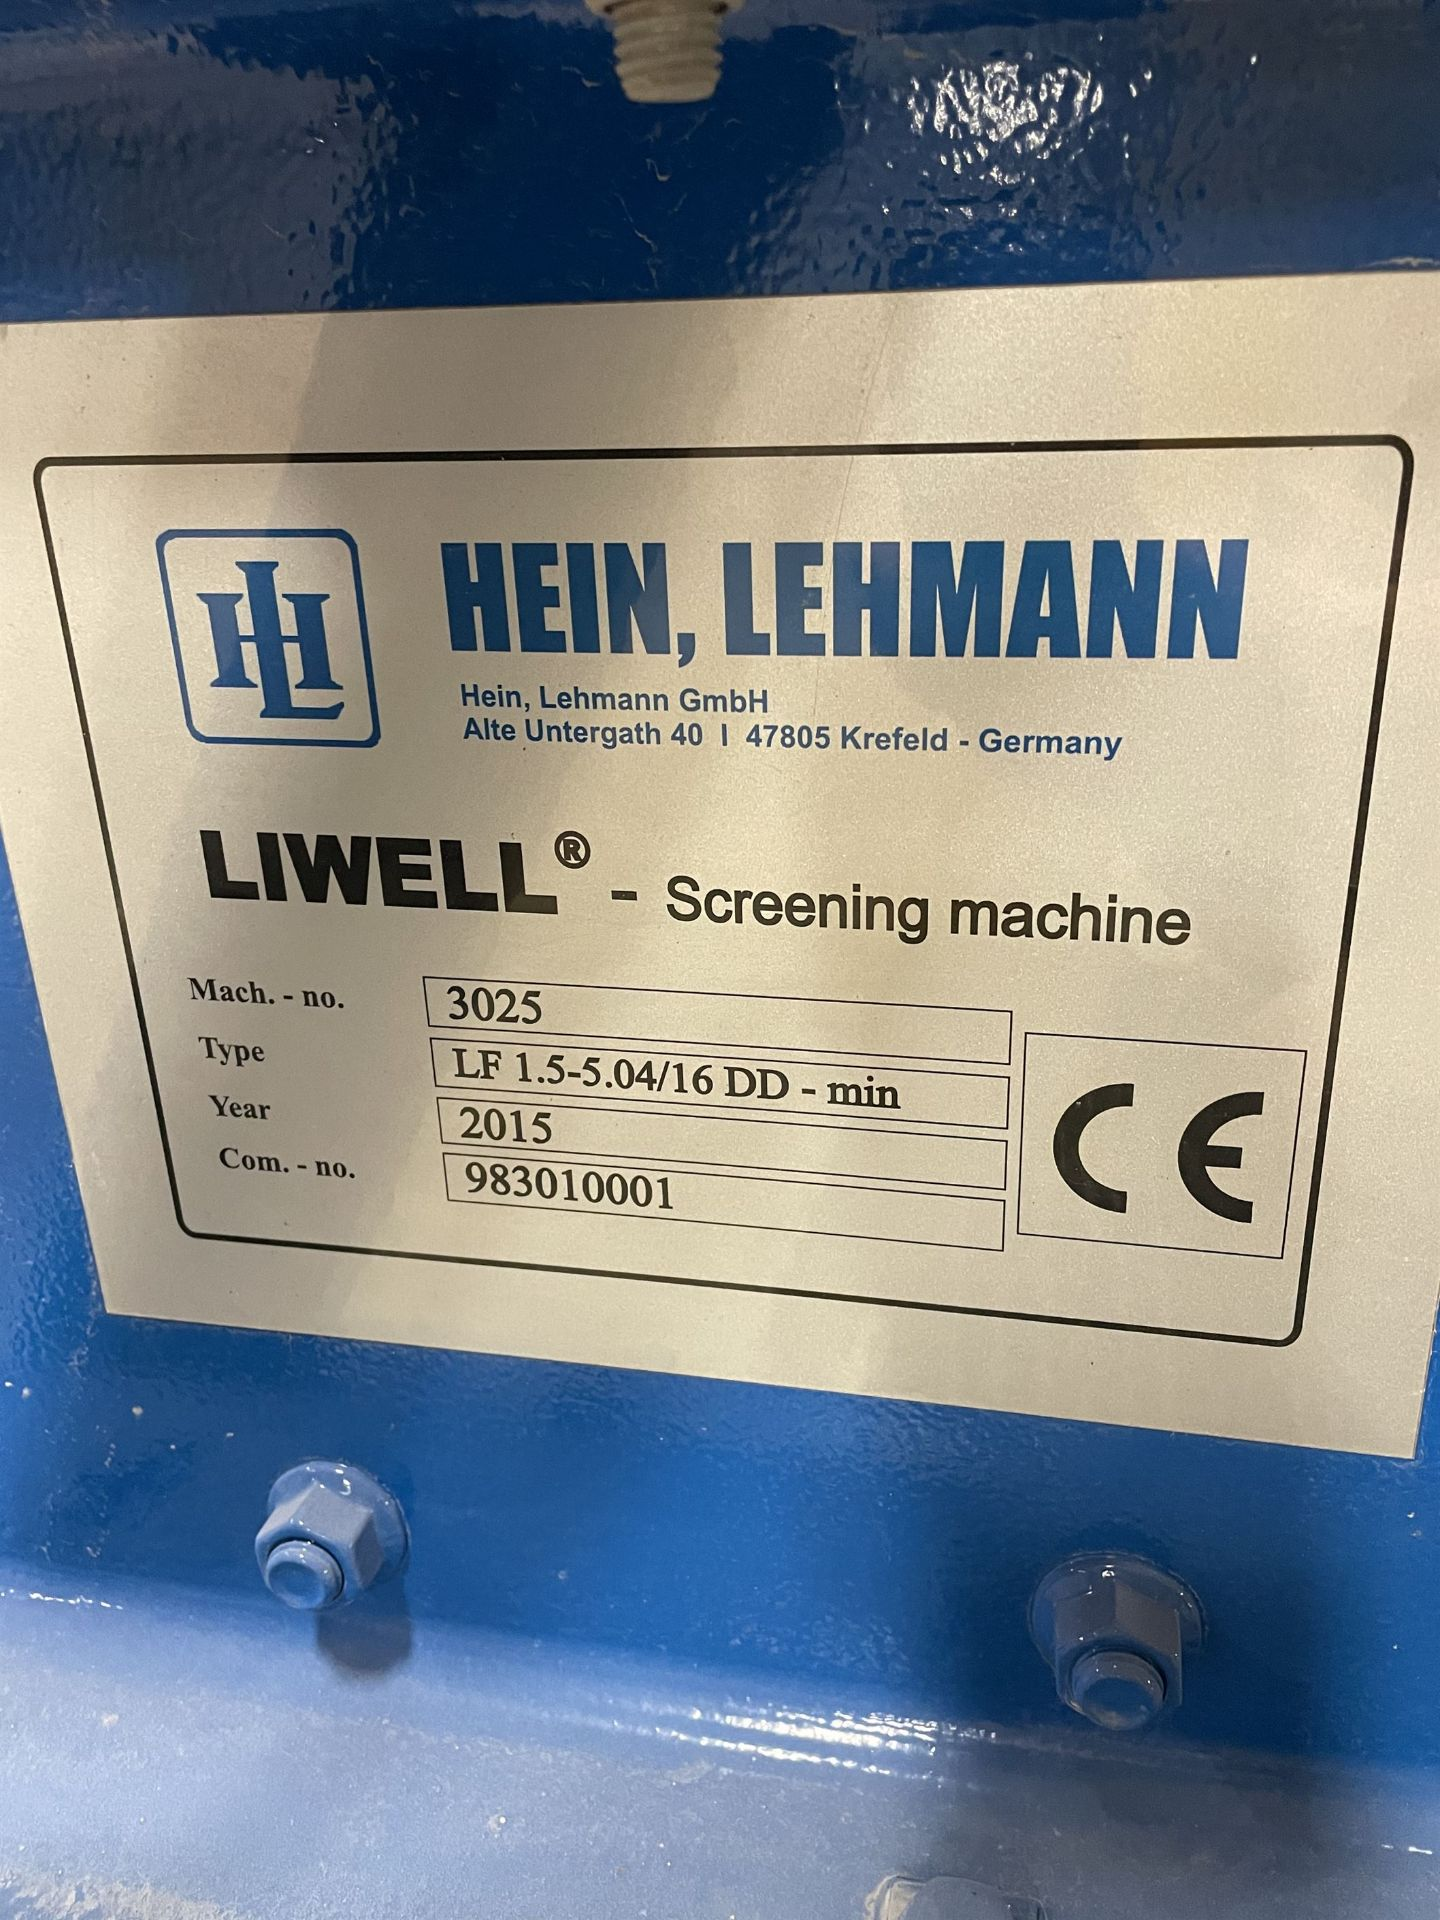 2015 HEIN LEHMANN LF 1.5-5.04/16 DD - min Screening Machine, s/n 3025 [Subject to Bulk Bid on Lot # - Image 5 of 5